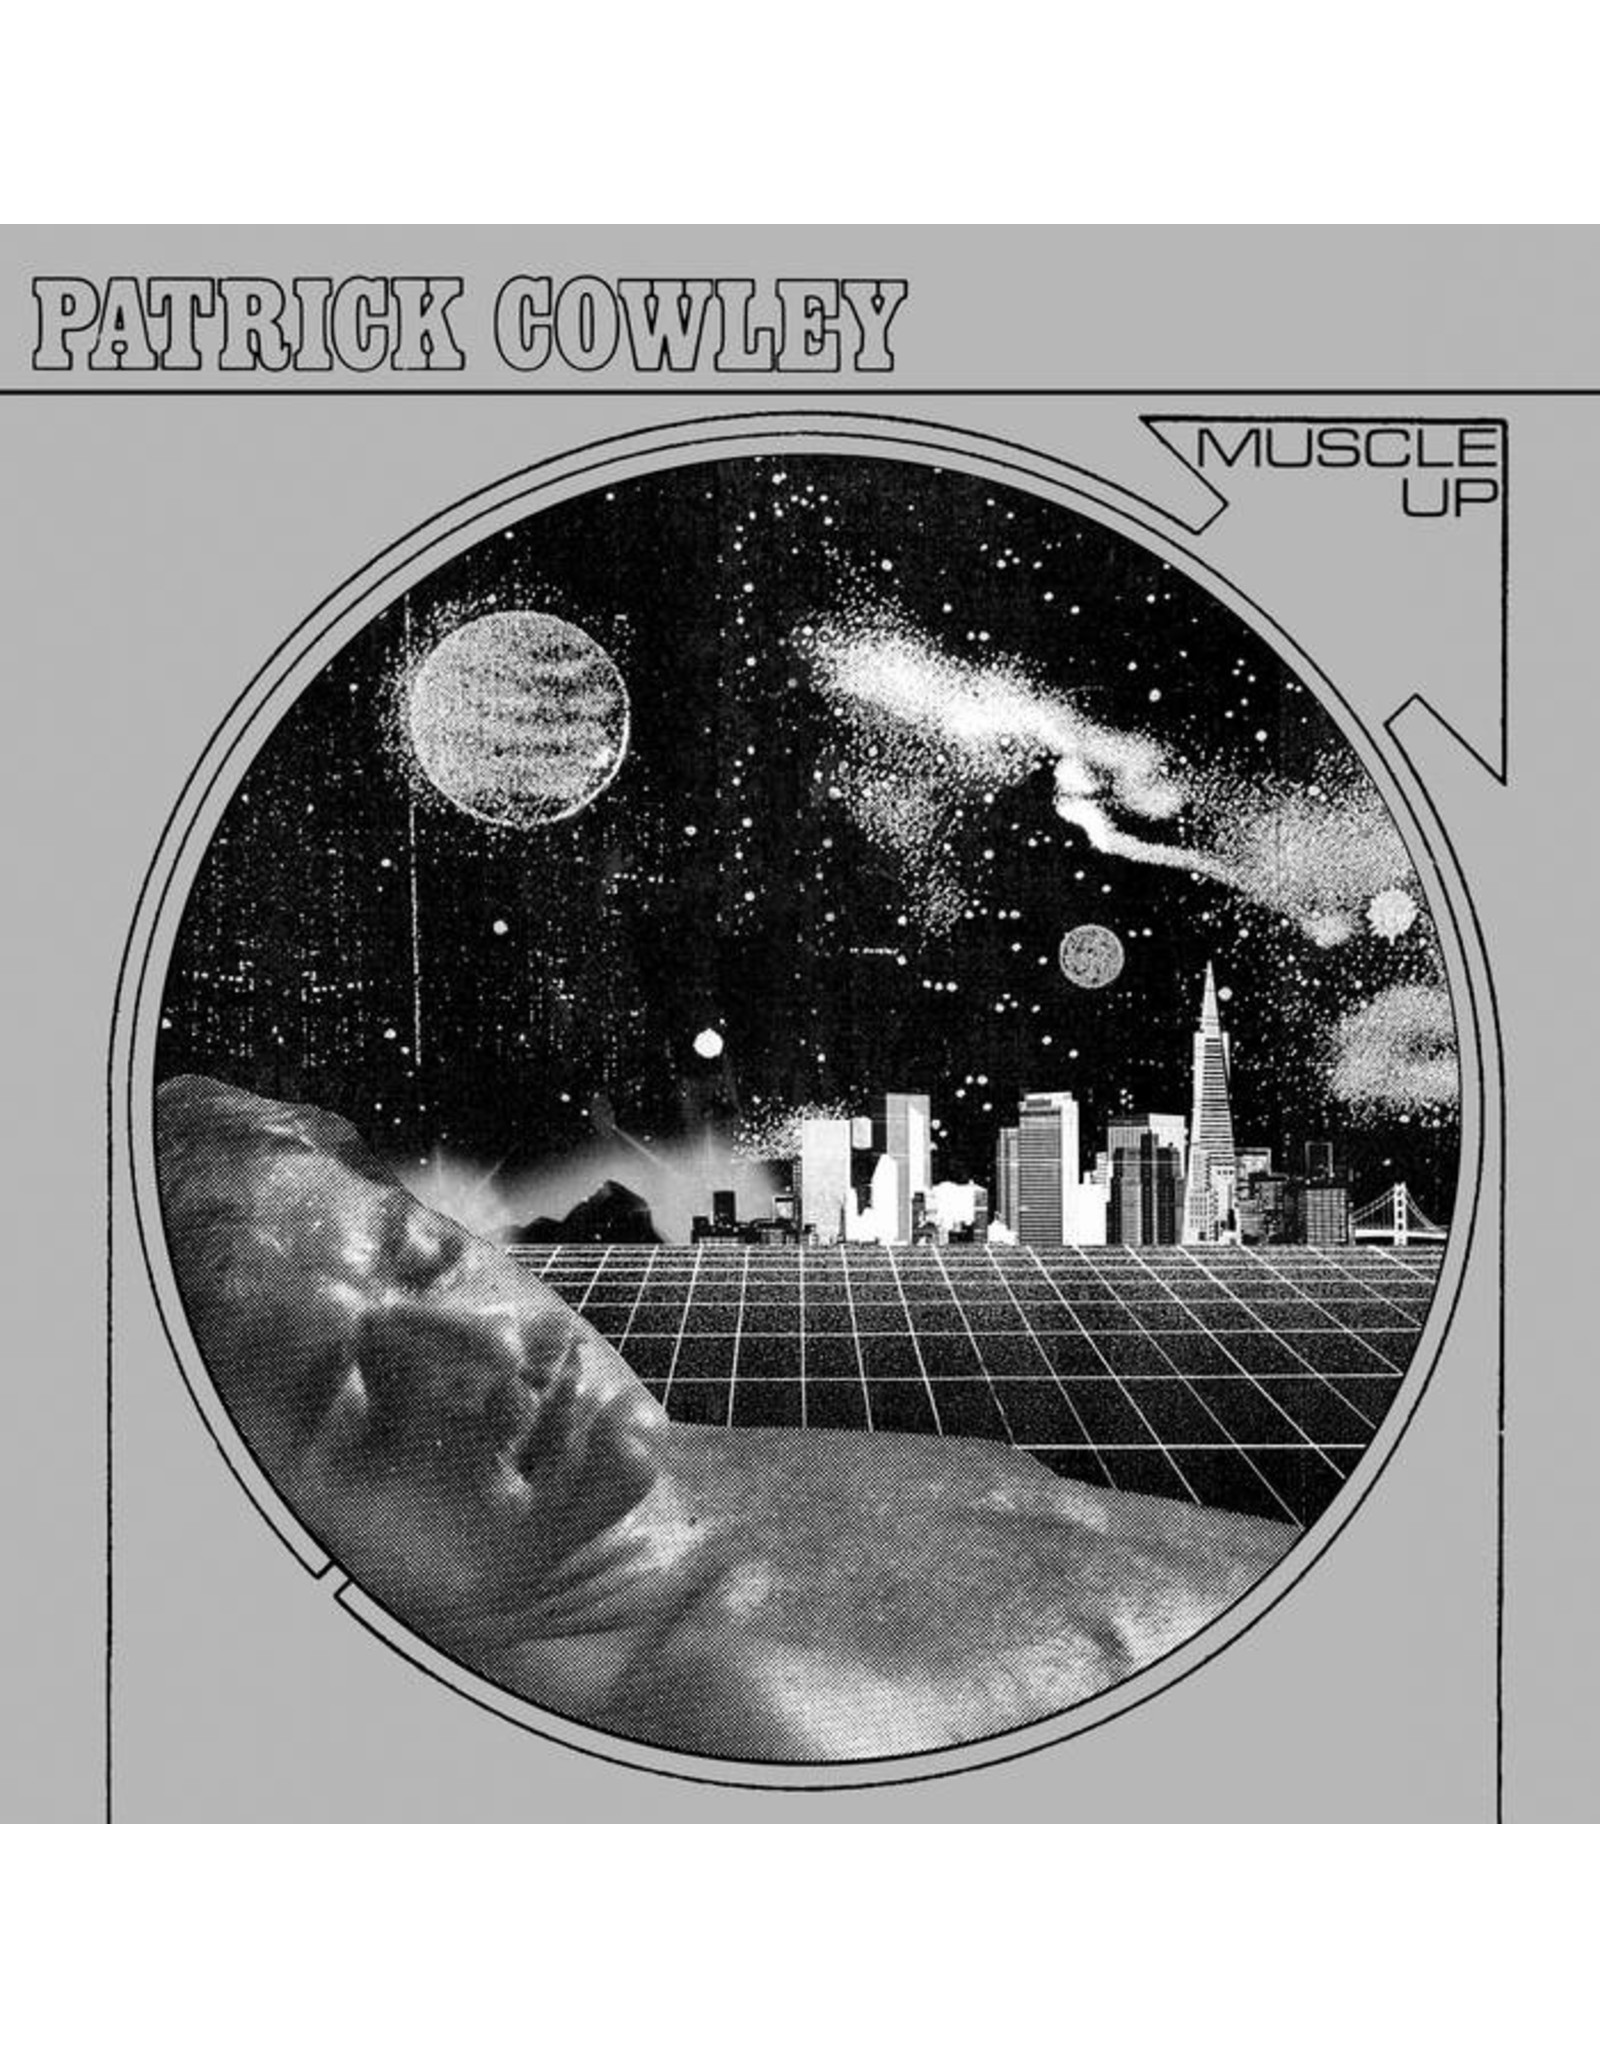 New Vinyl Patrick Cowley - Muscle Up 2LP